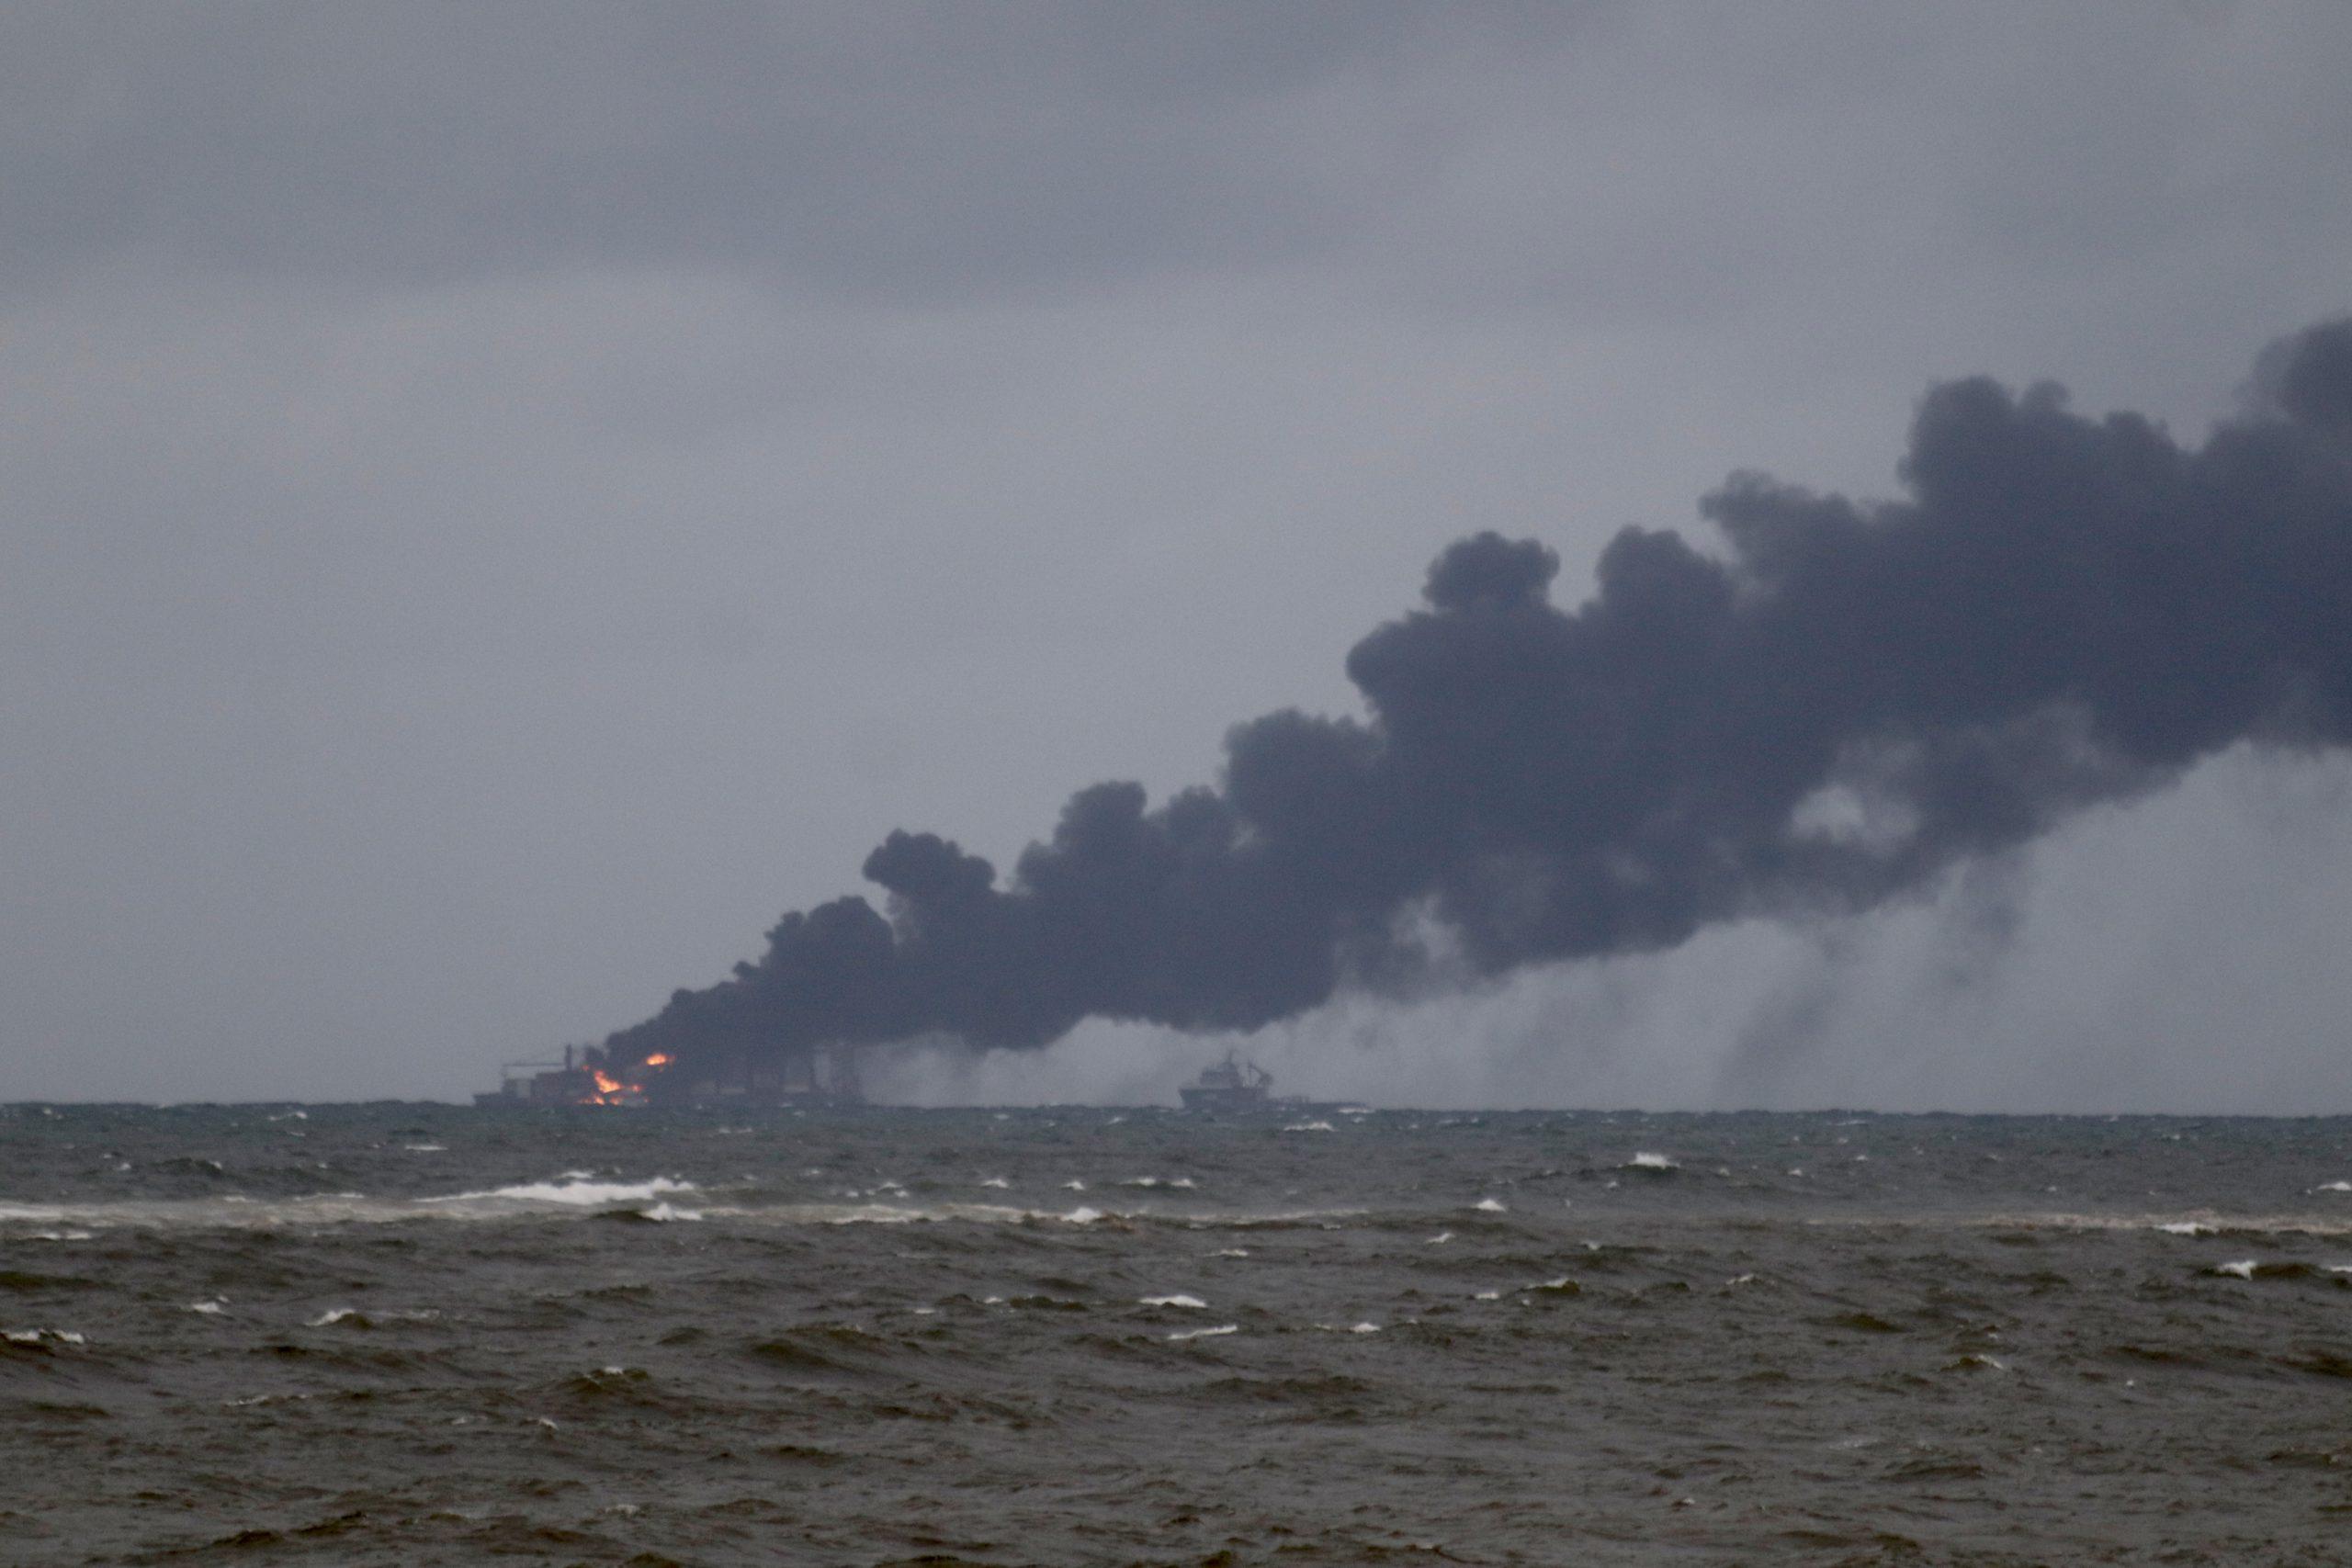 Chemical Fire on the X-Press Pearl off the coast of Sri Lanka